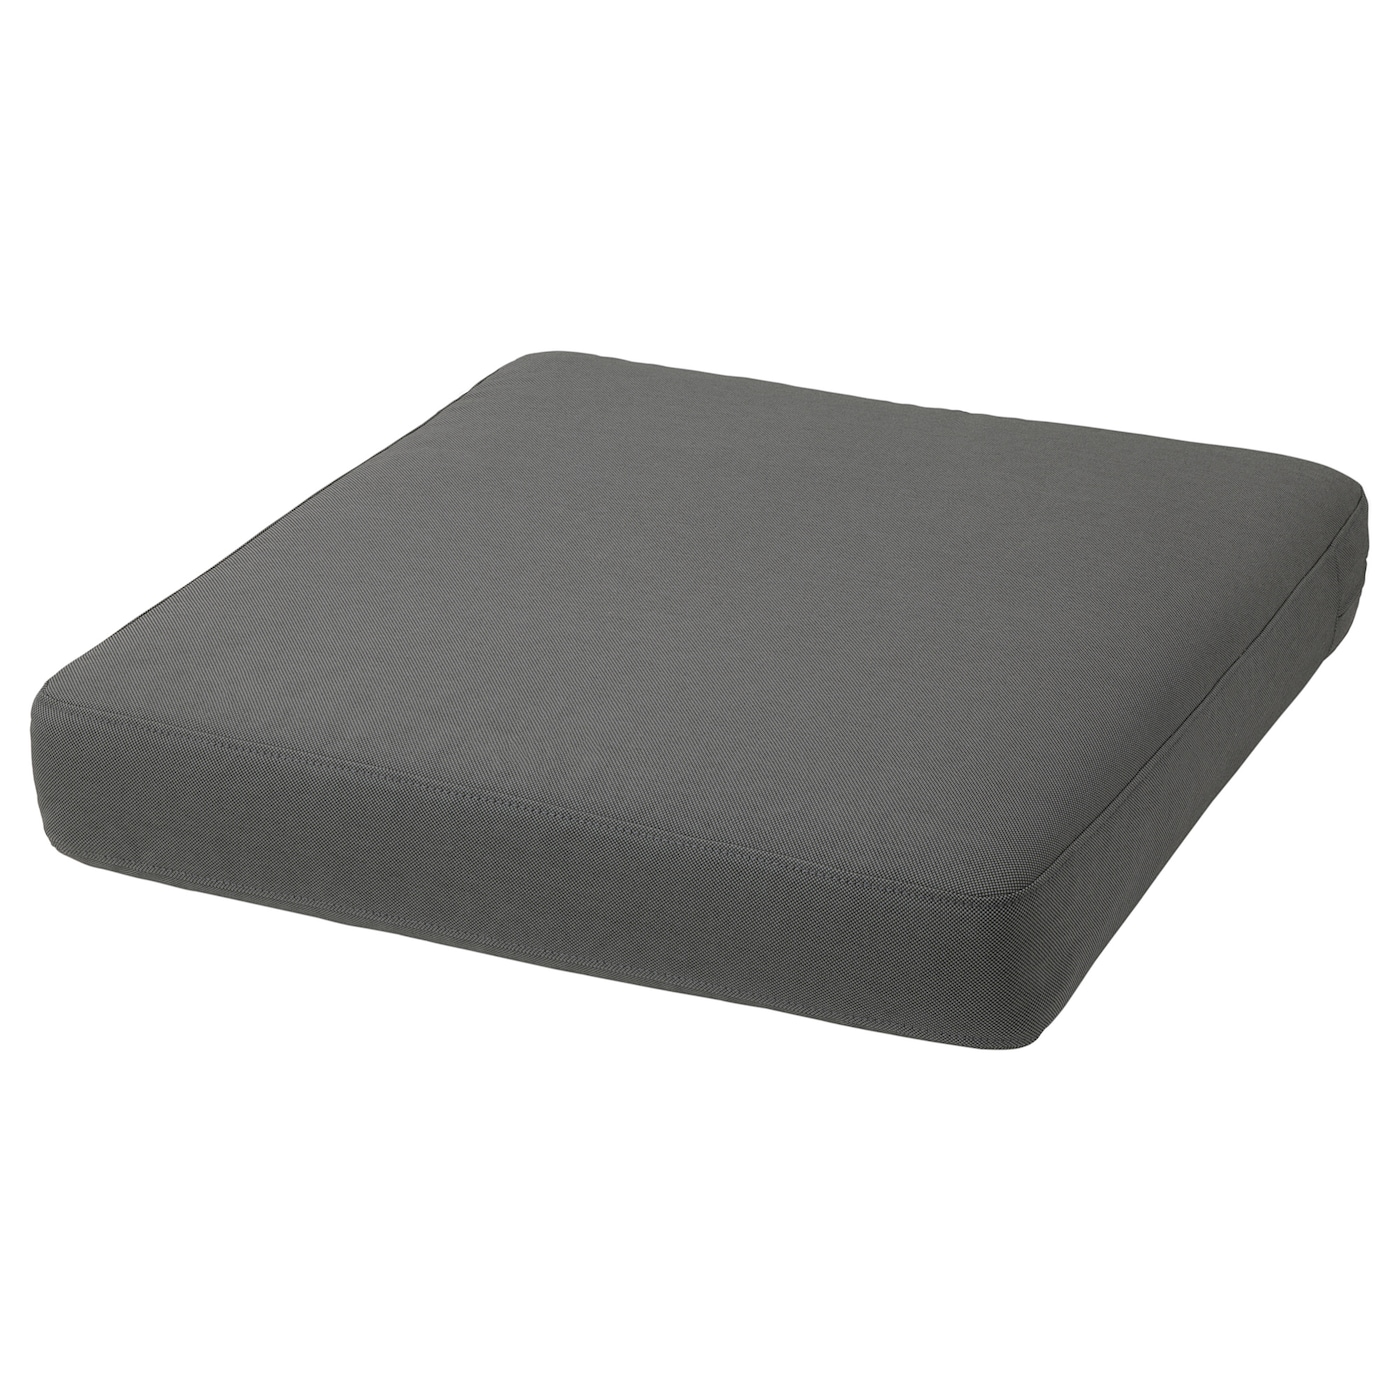 Duvholmen Seat Pad Outdoor Dark Gray